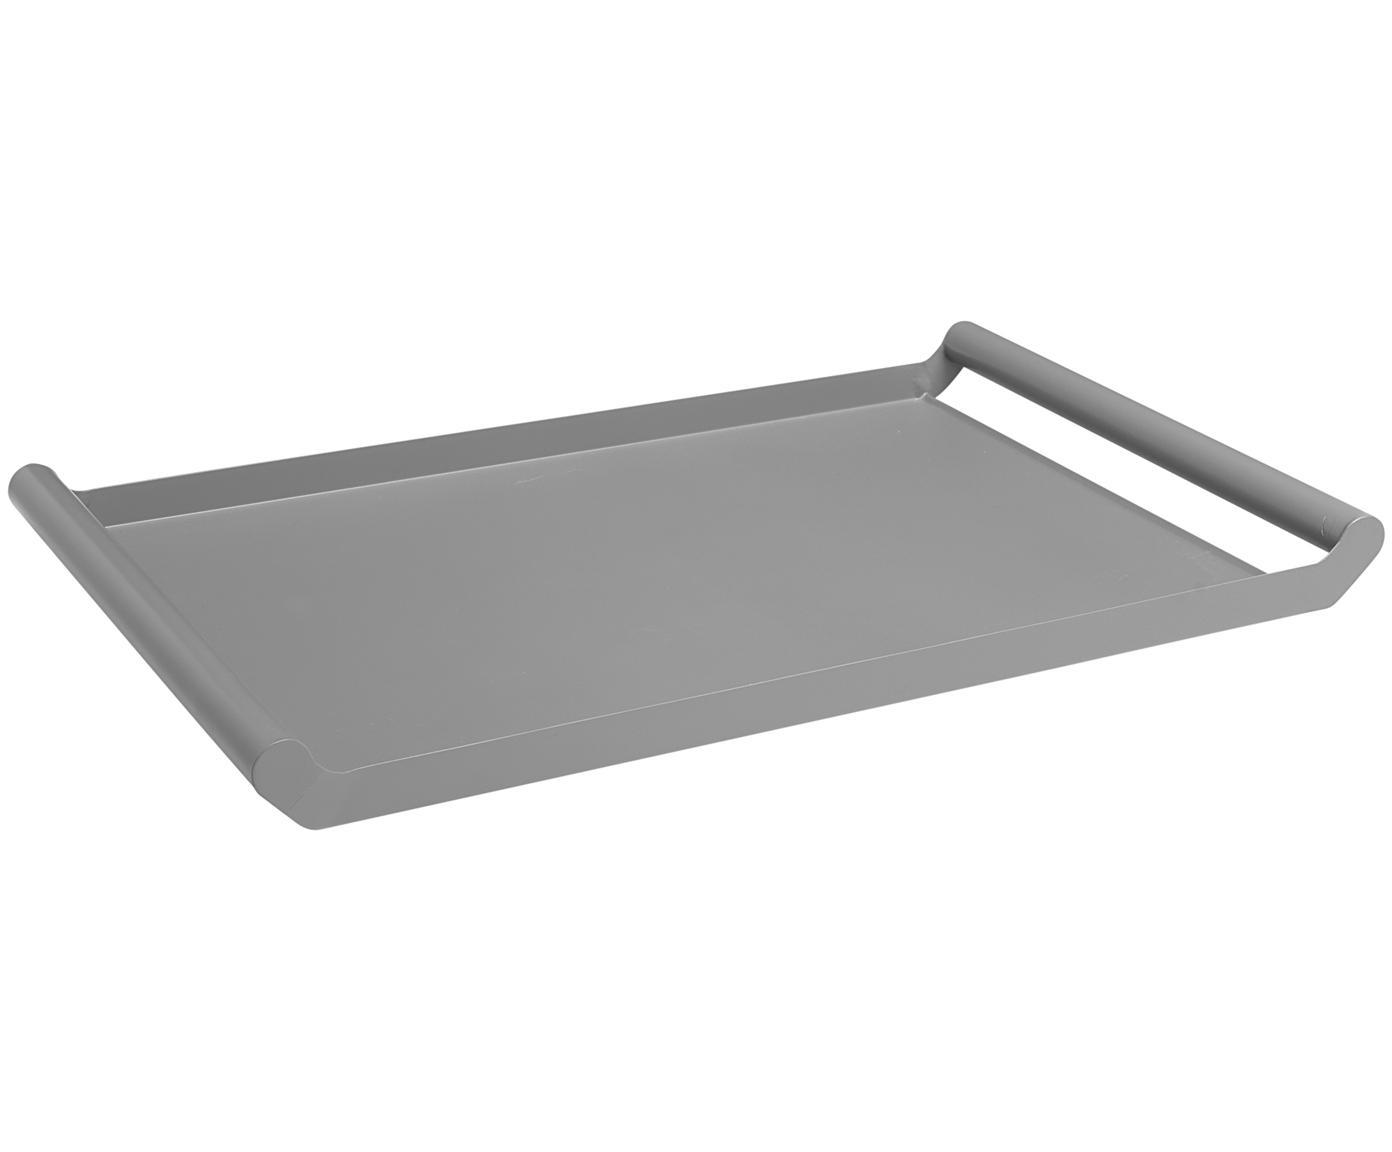 Vassoio da portata grigio Charlie, Metallo rivestito, Grigio, Larg. 50 x Prof. 30 cm